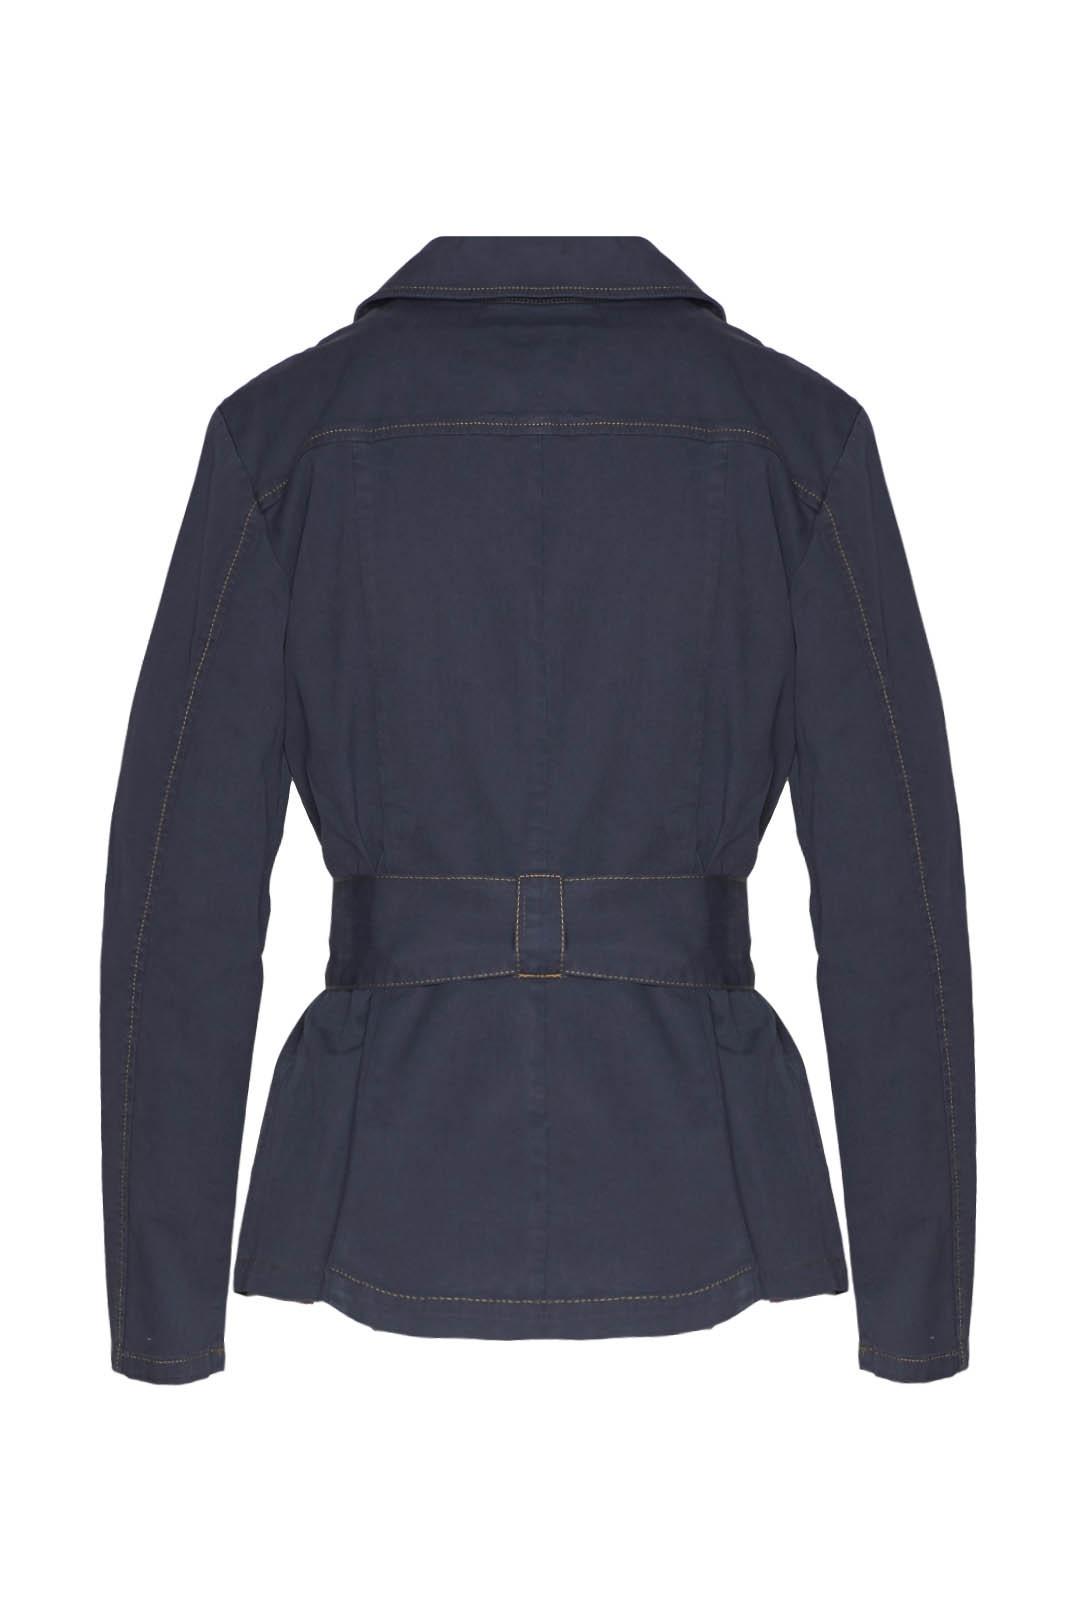 Sahariana Jacke aus Baumwolle 2